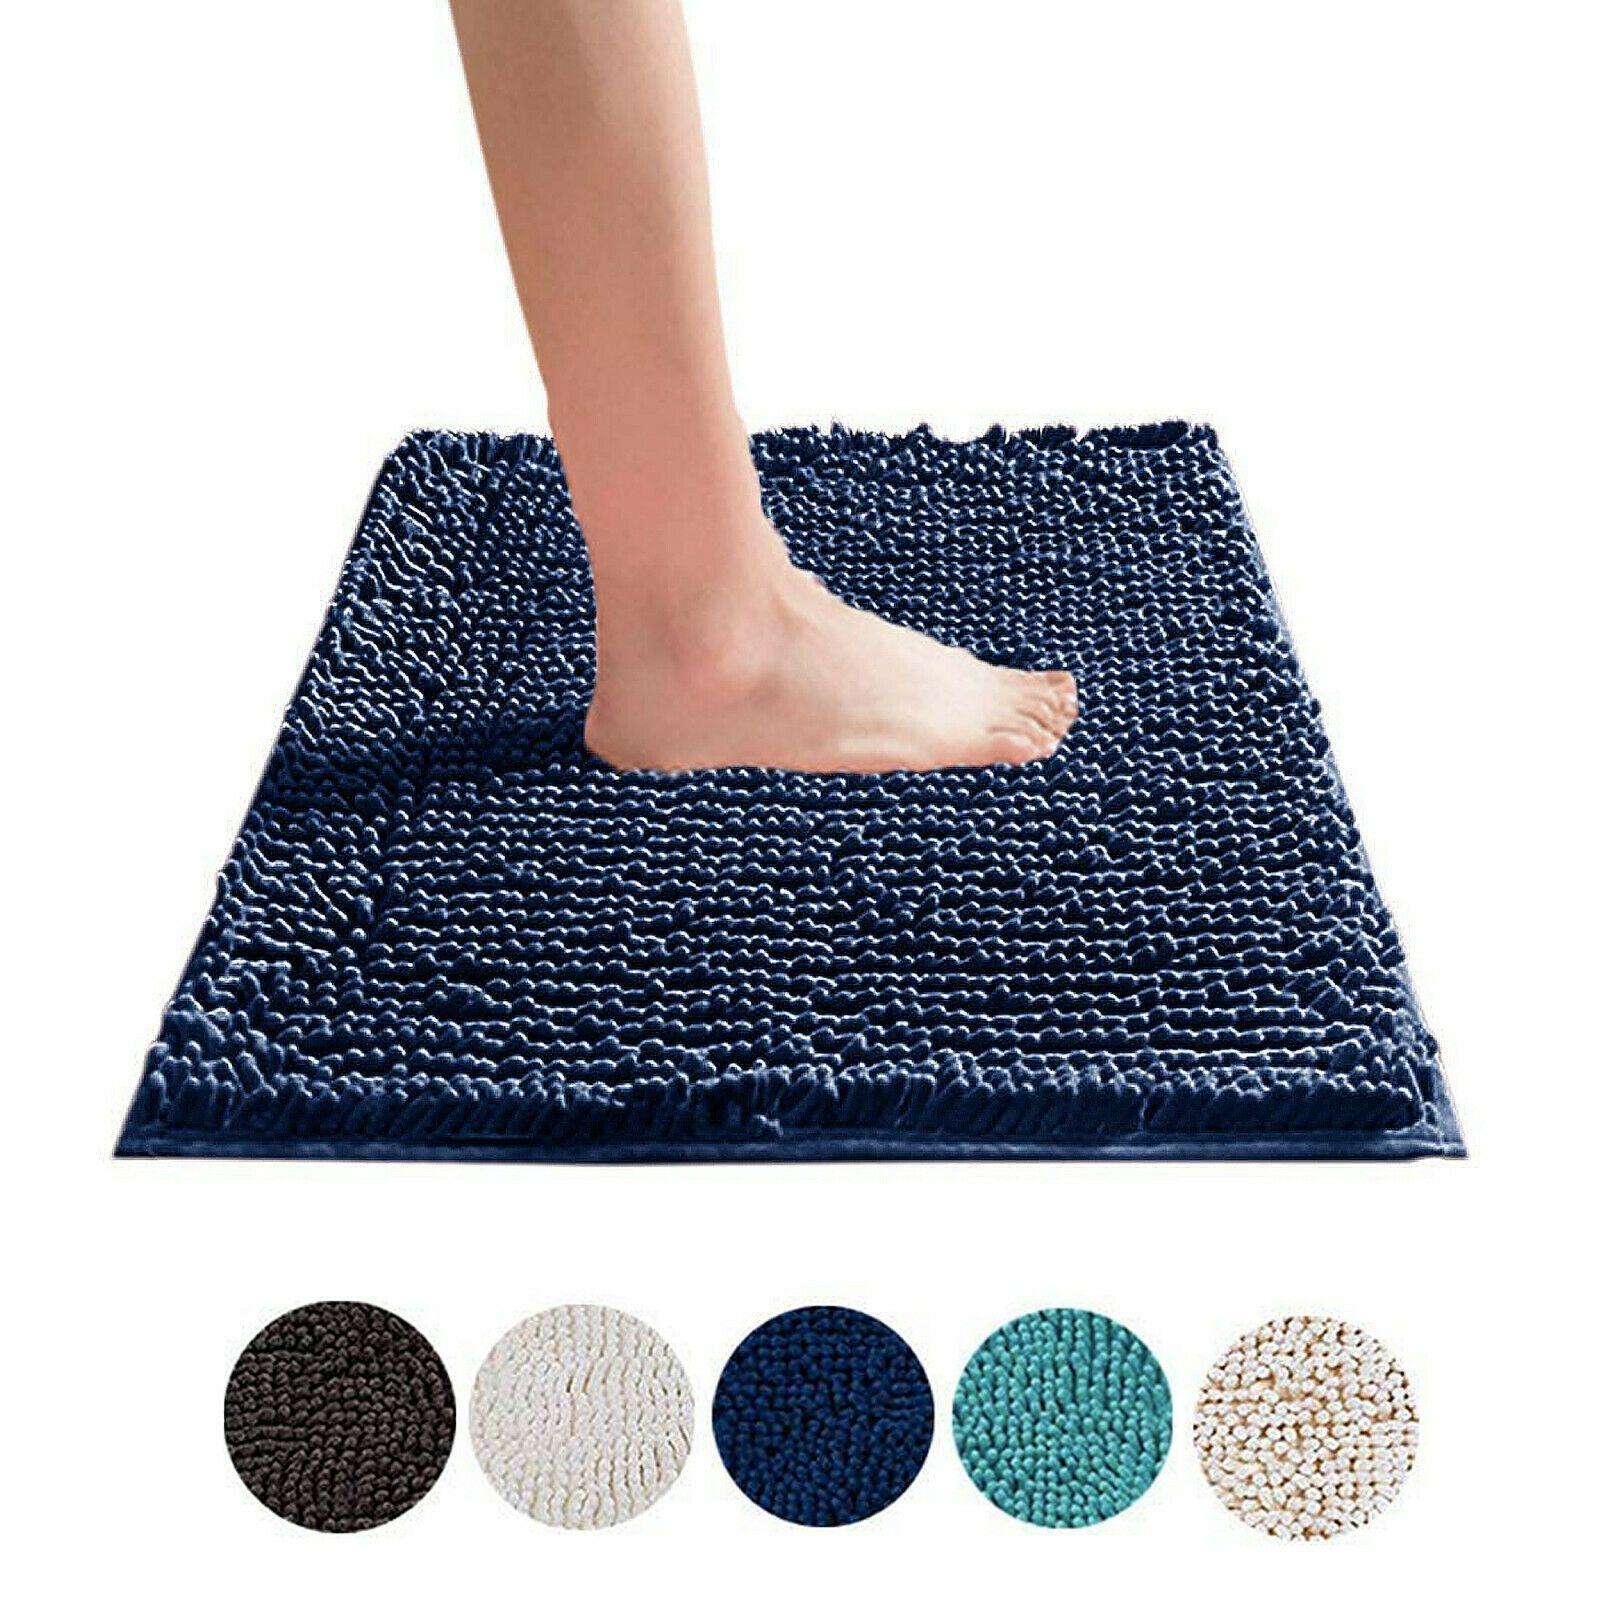 Microfibre Bath Rug Anti Slip Soft Shaggy Chenille Bathroom Floor Mats Towelogy Ebay Bathroom Rugs Bath Mat Microfibre